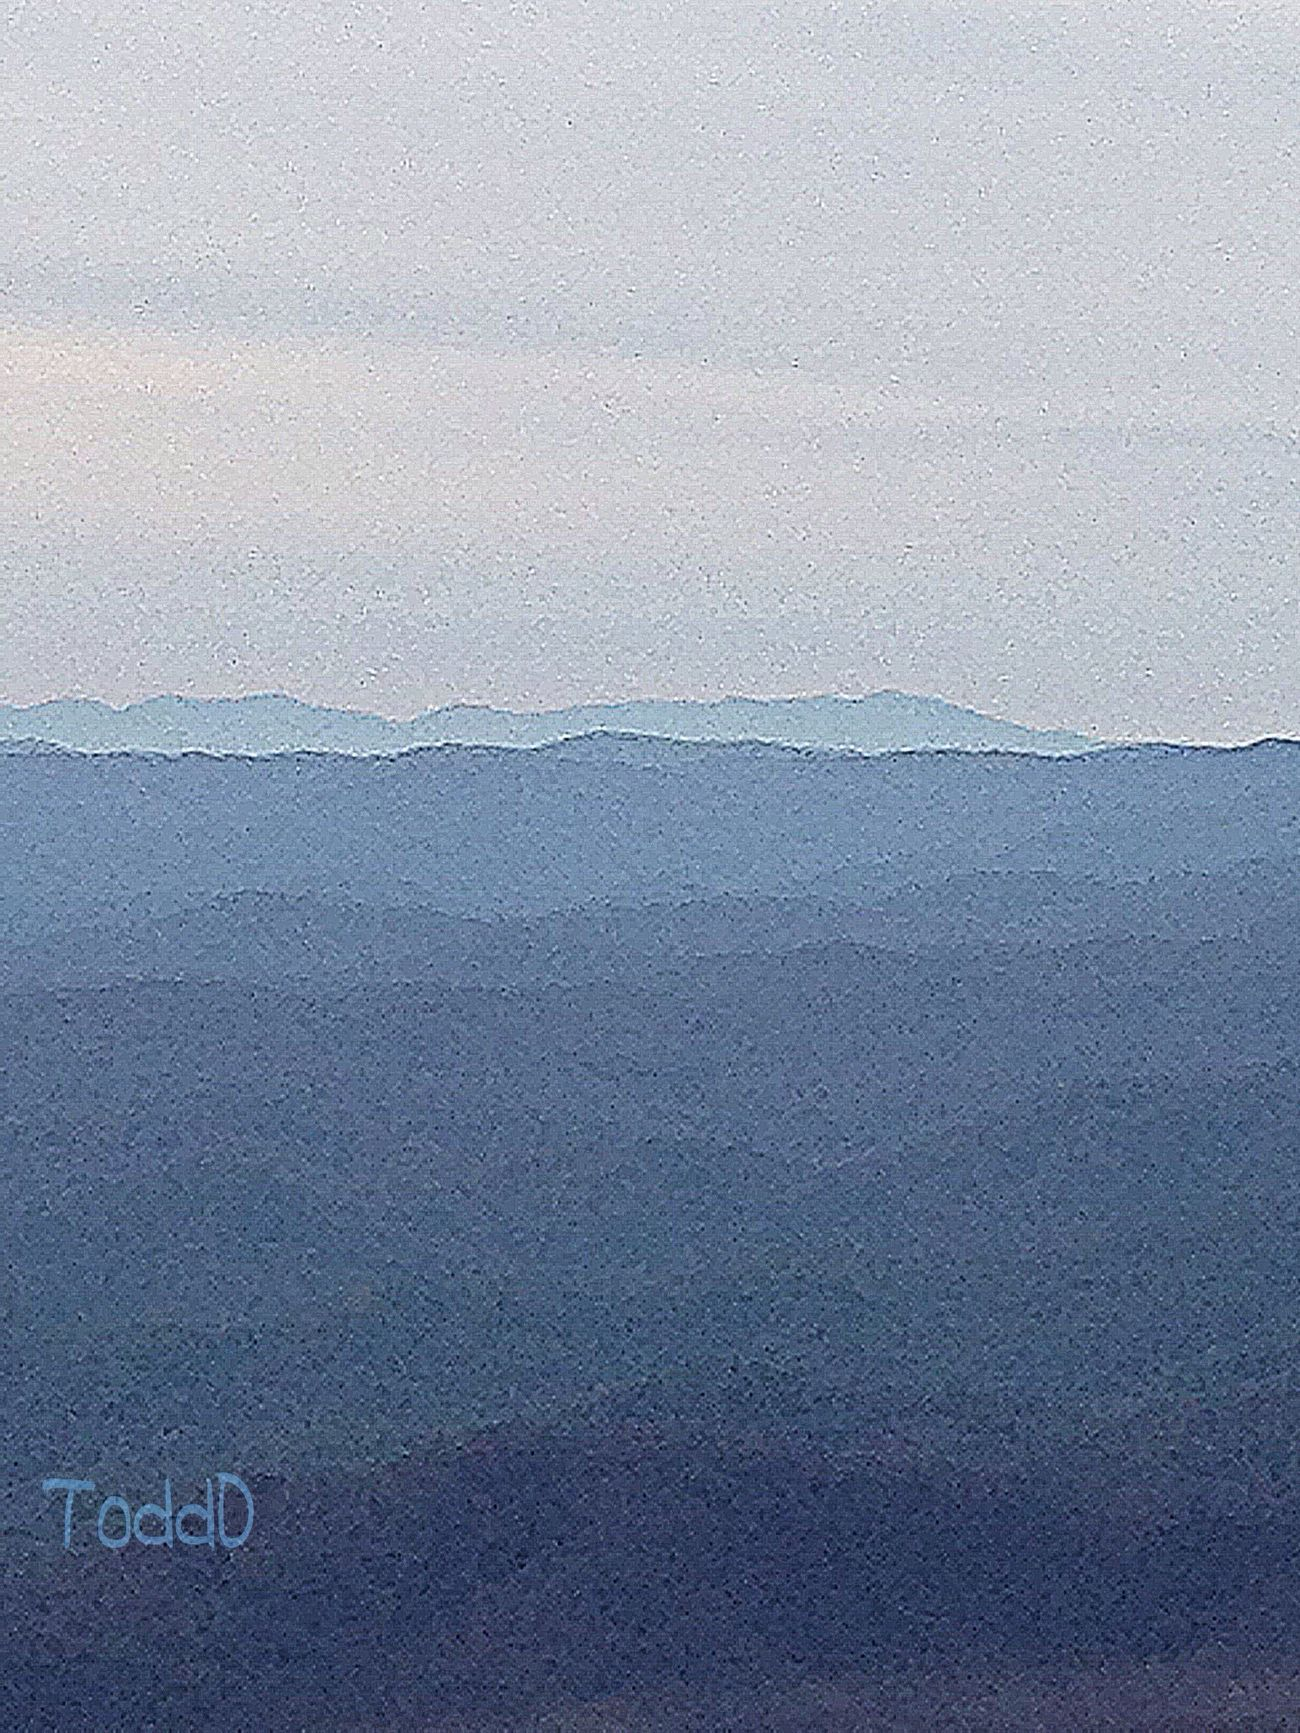 Beautiful mountains, no edit. Taking Photos EyeEm Best Shots - Nature StreamzooNature EyeEm Best Shots